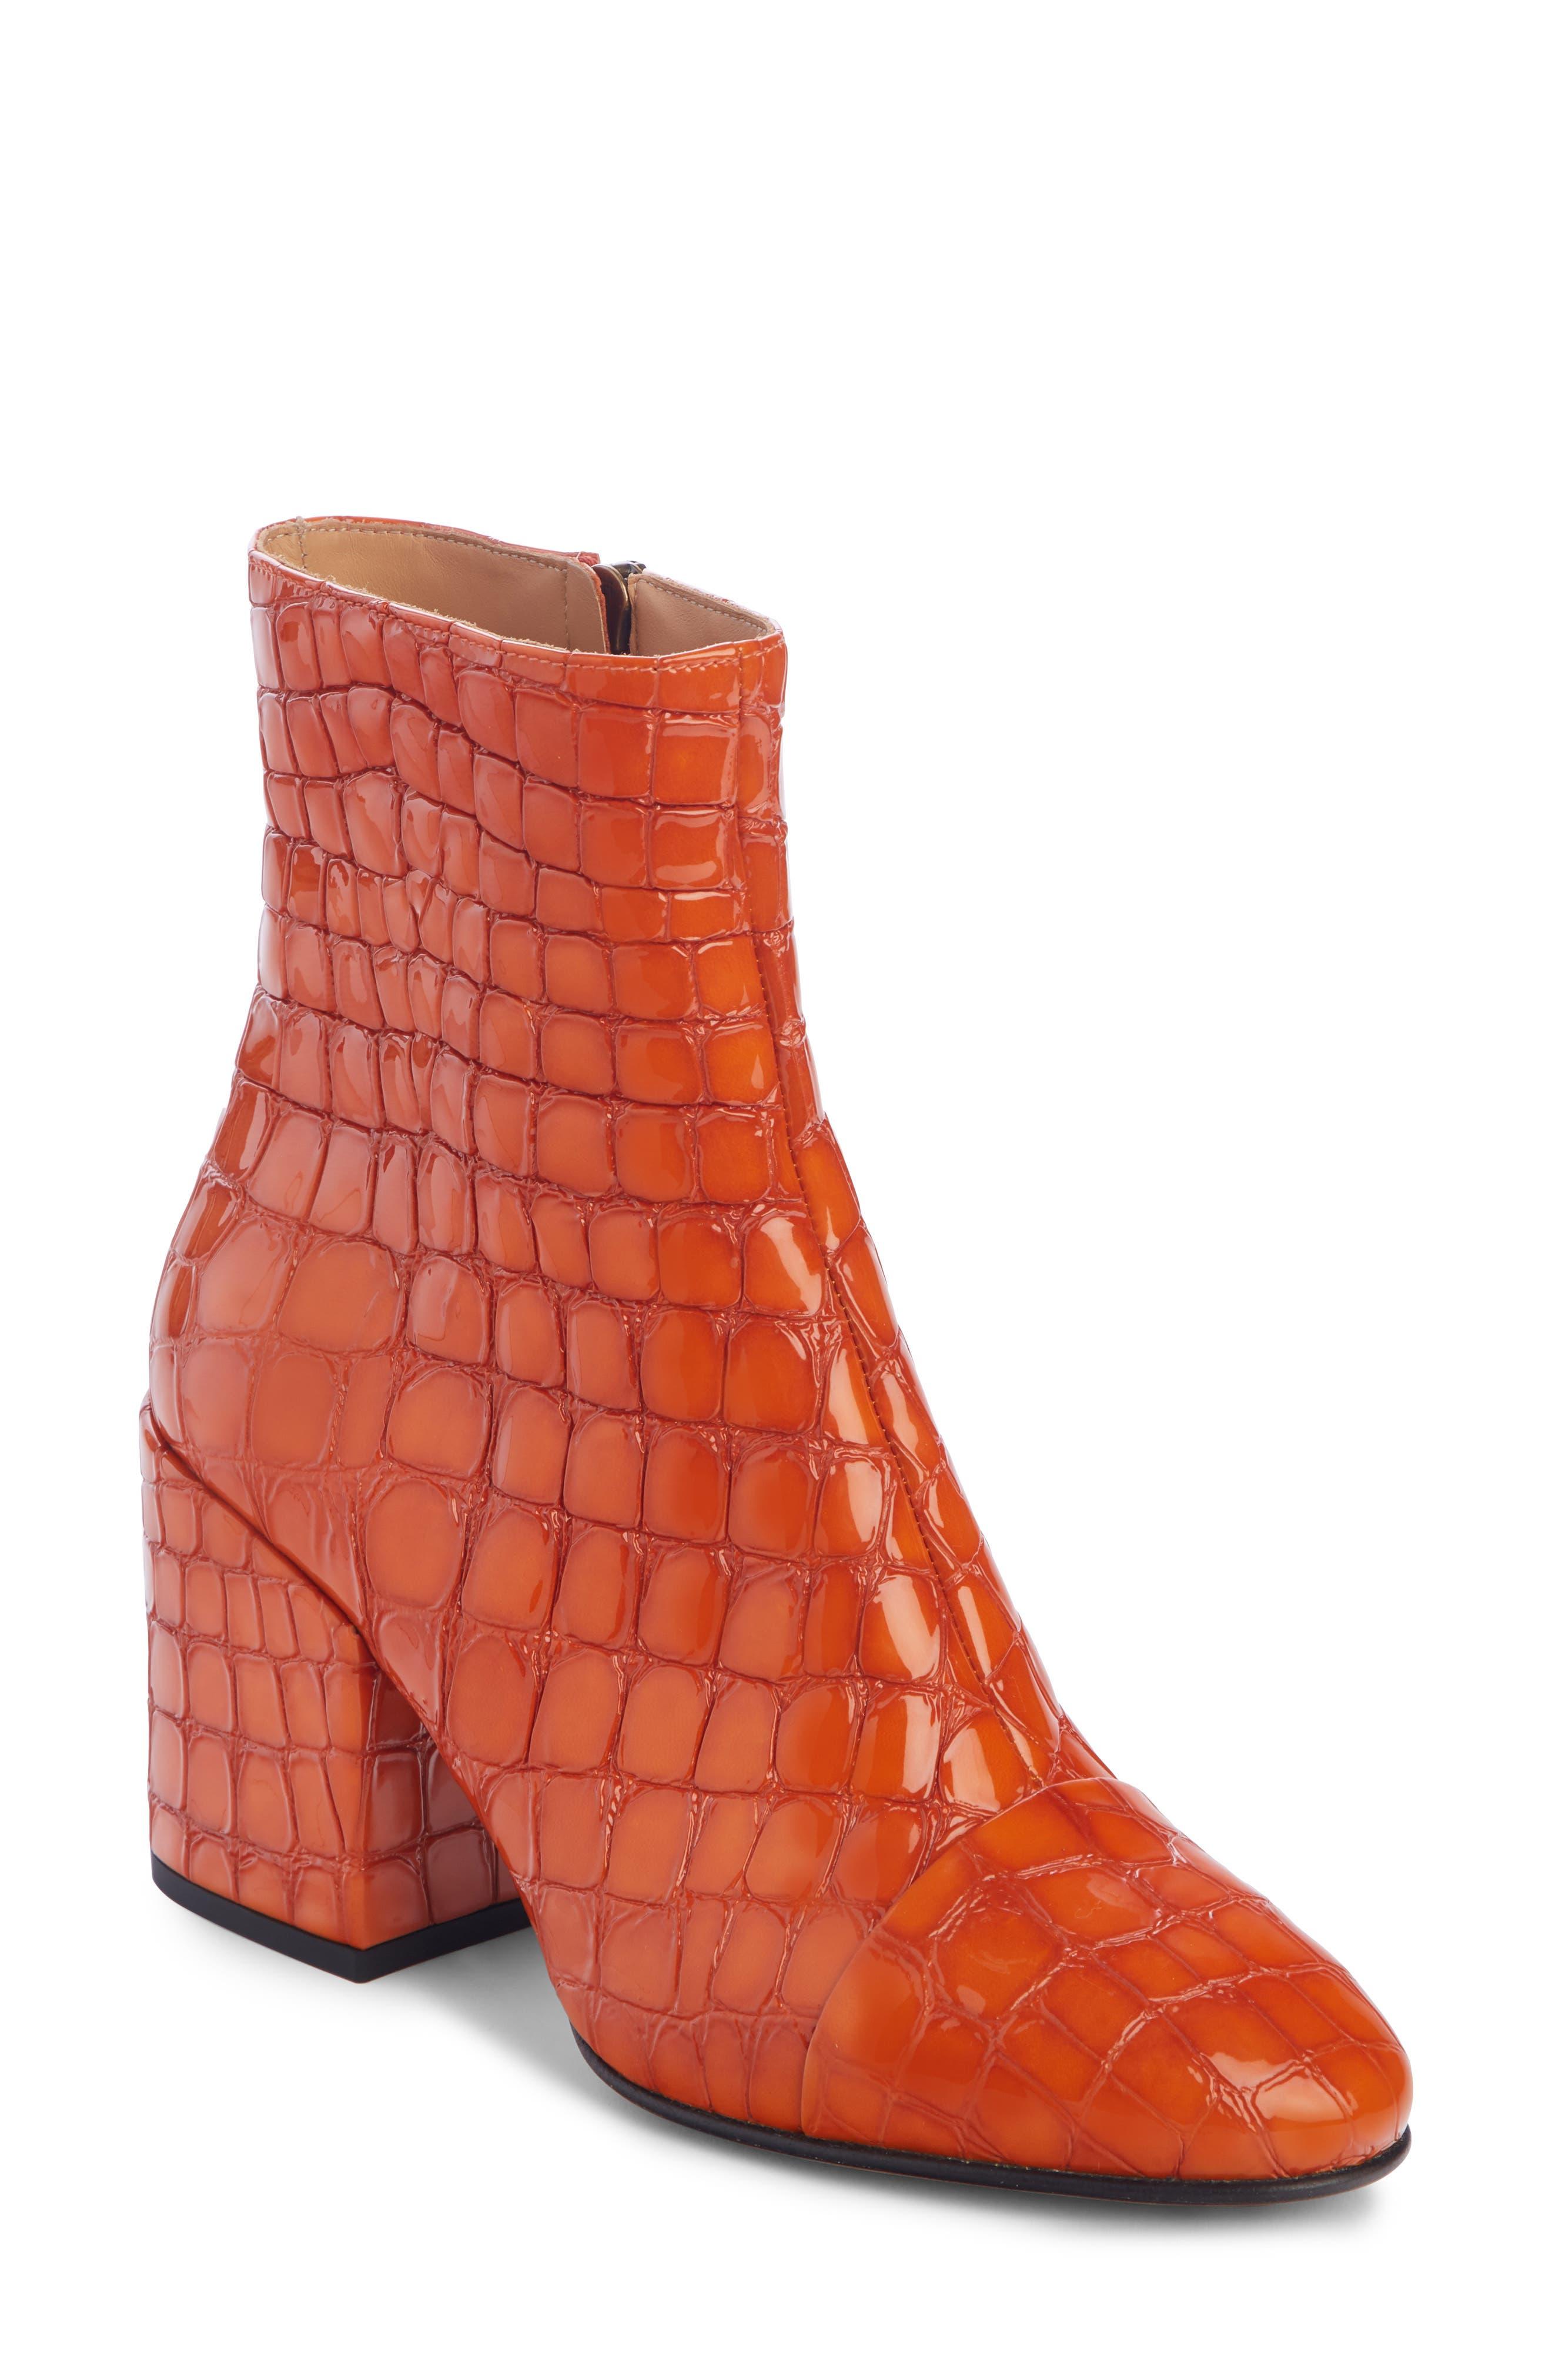 Shiny Crocodile-Print Booties in Orange